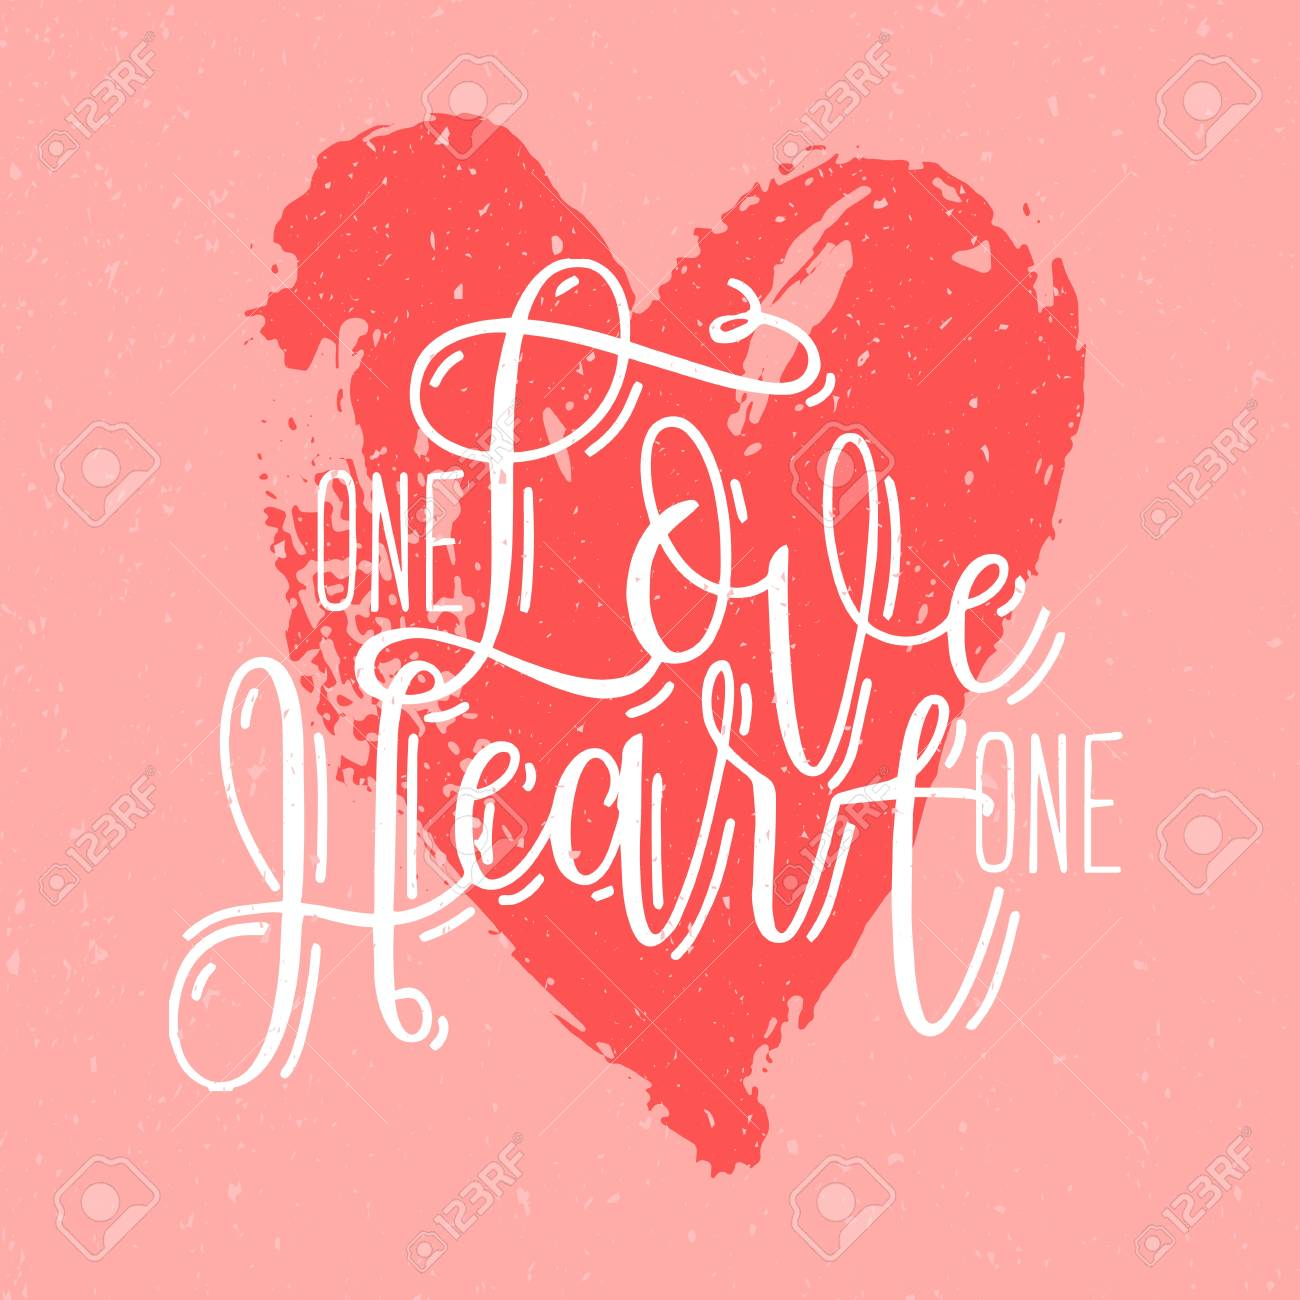 One Love One Heart Phrase Or Slogan Handwritten With Elegant